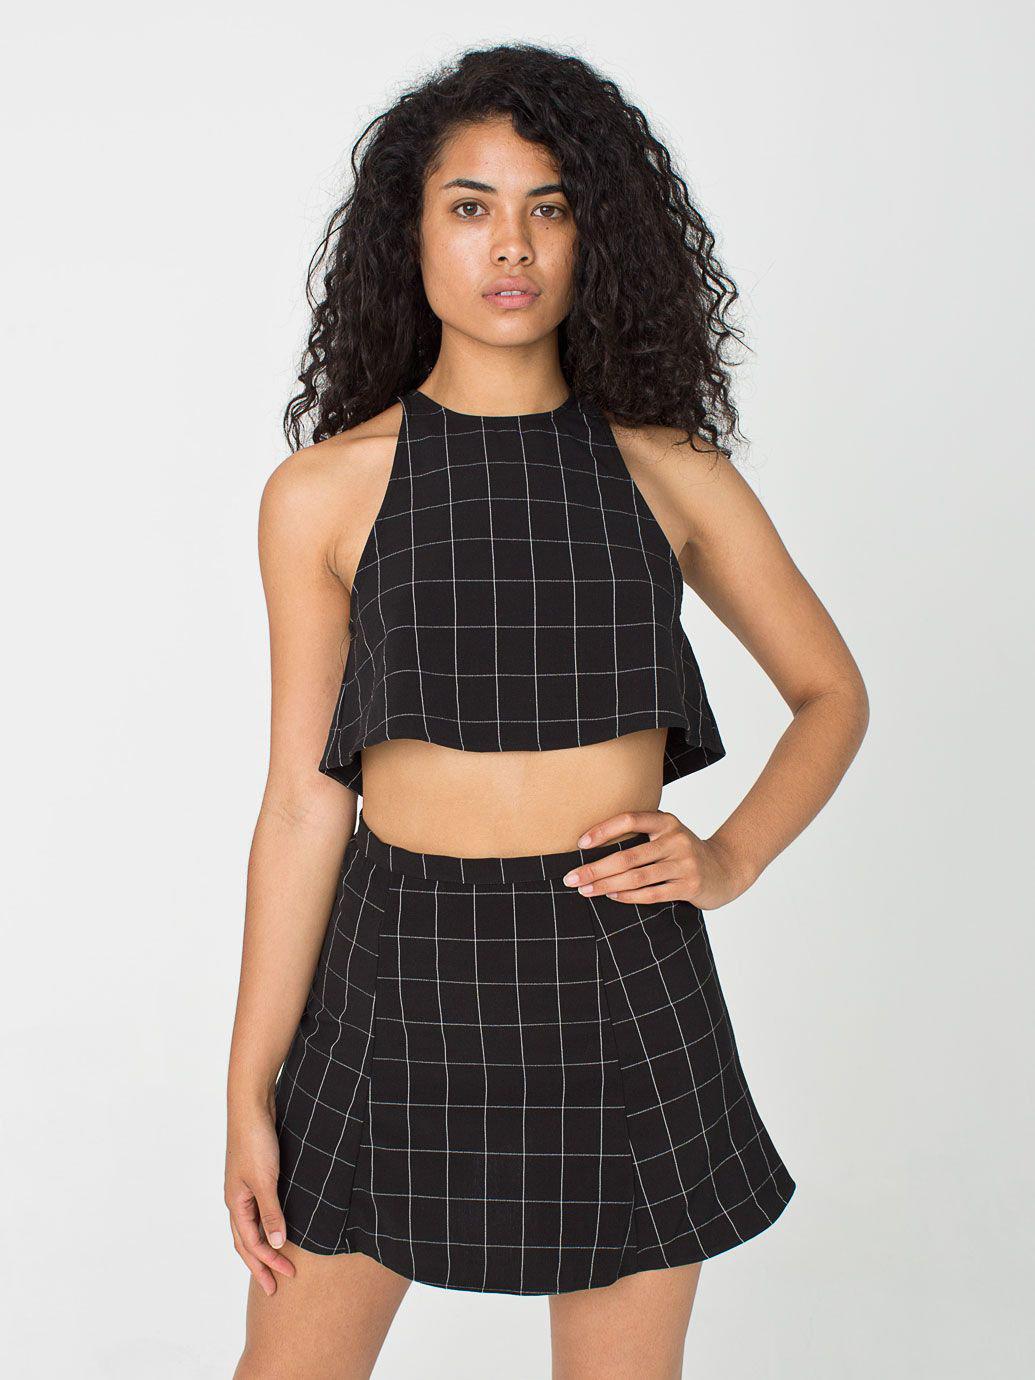 The Grid Print Lolita Mini Skirt   American Apparel